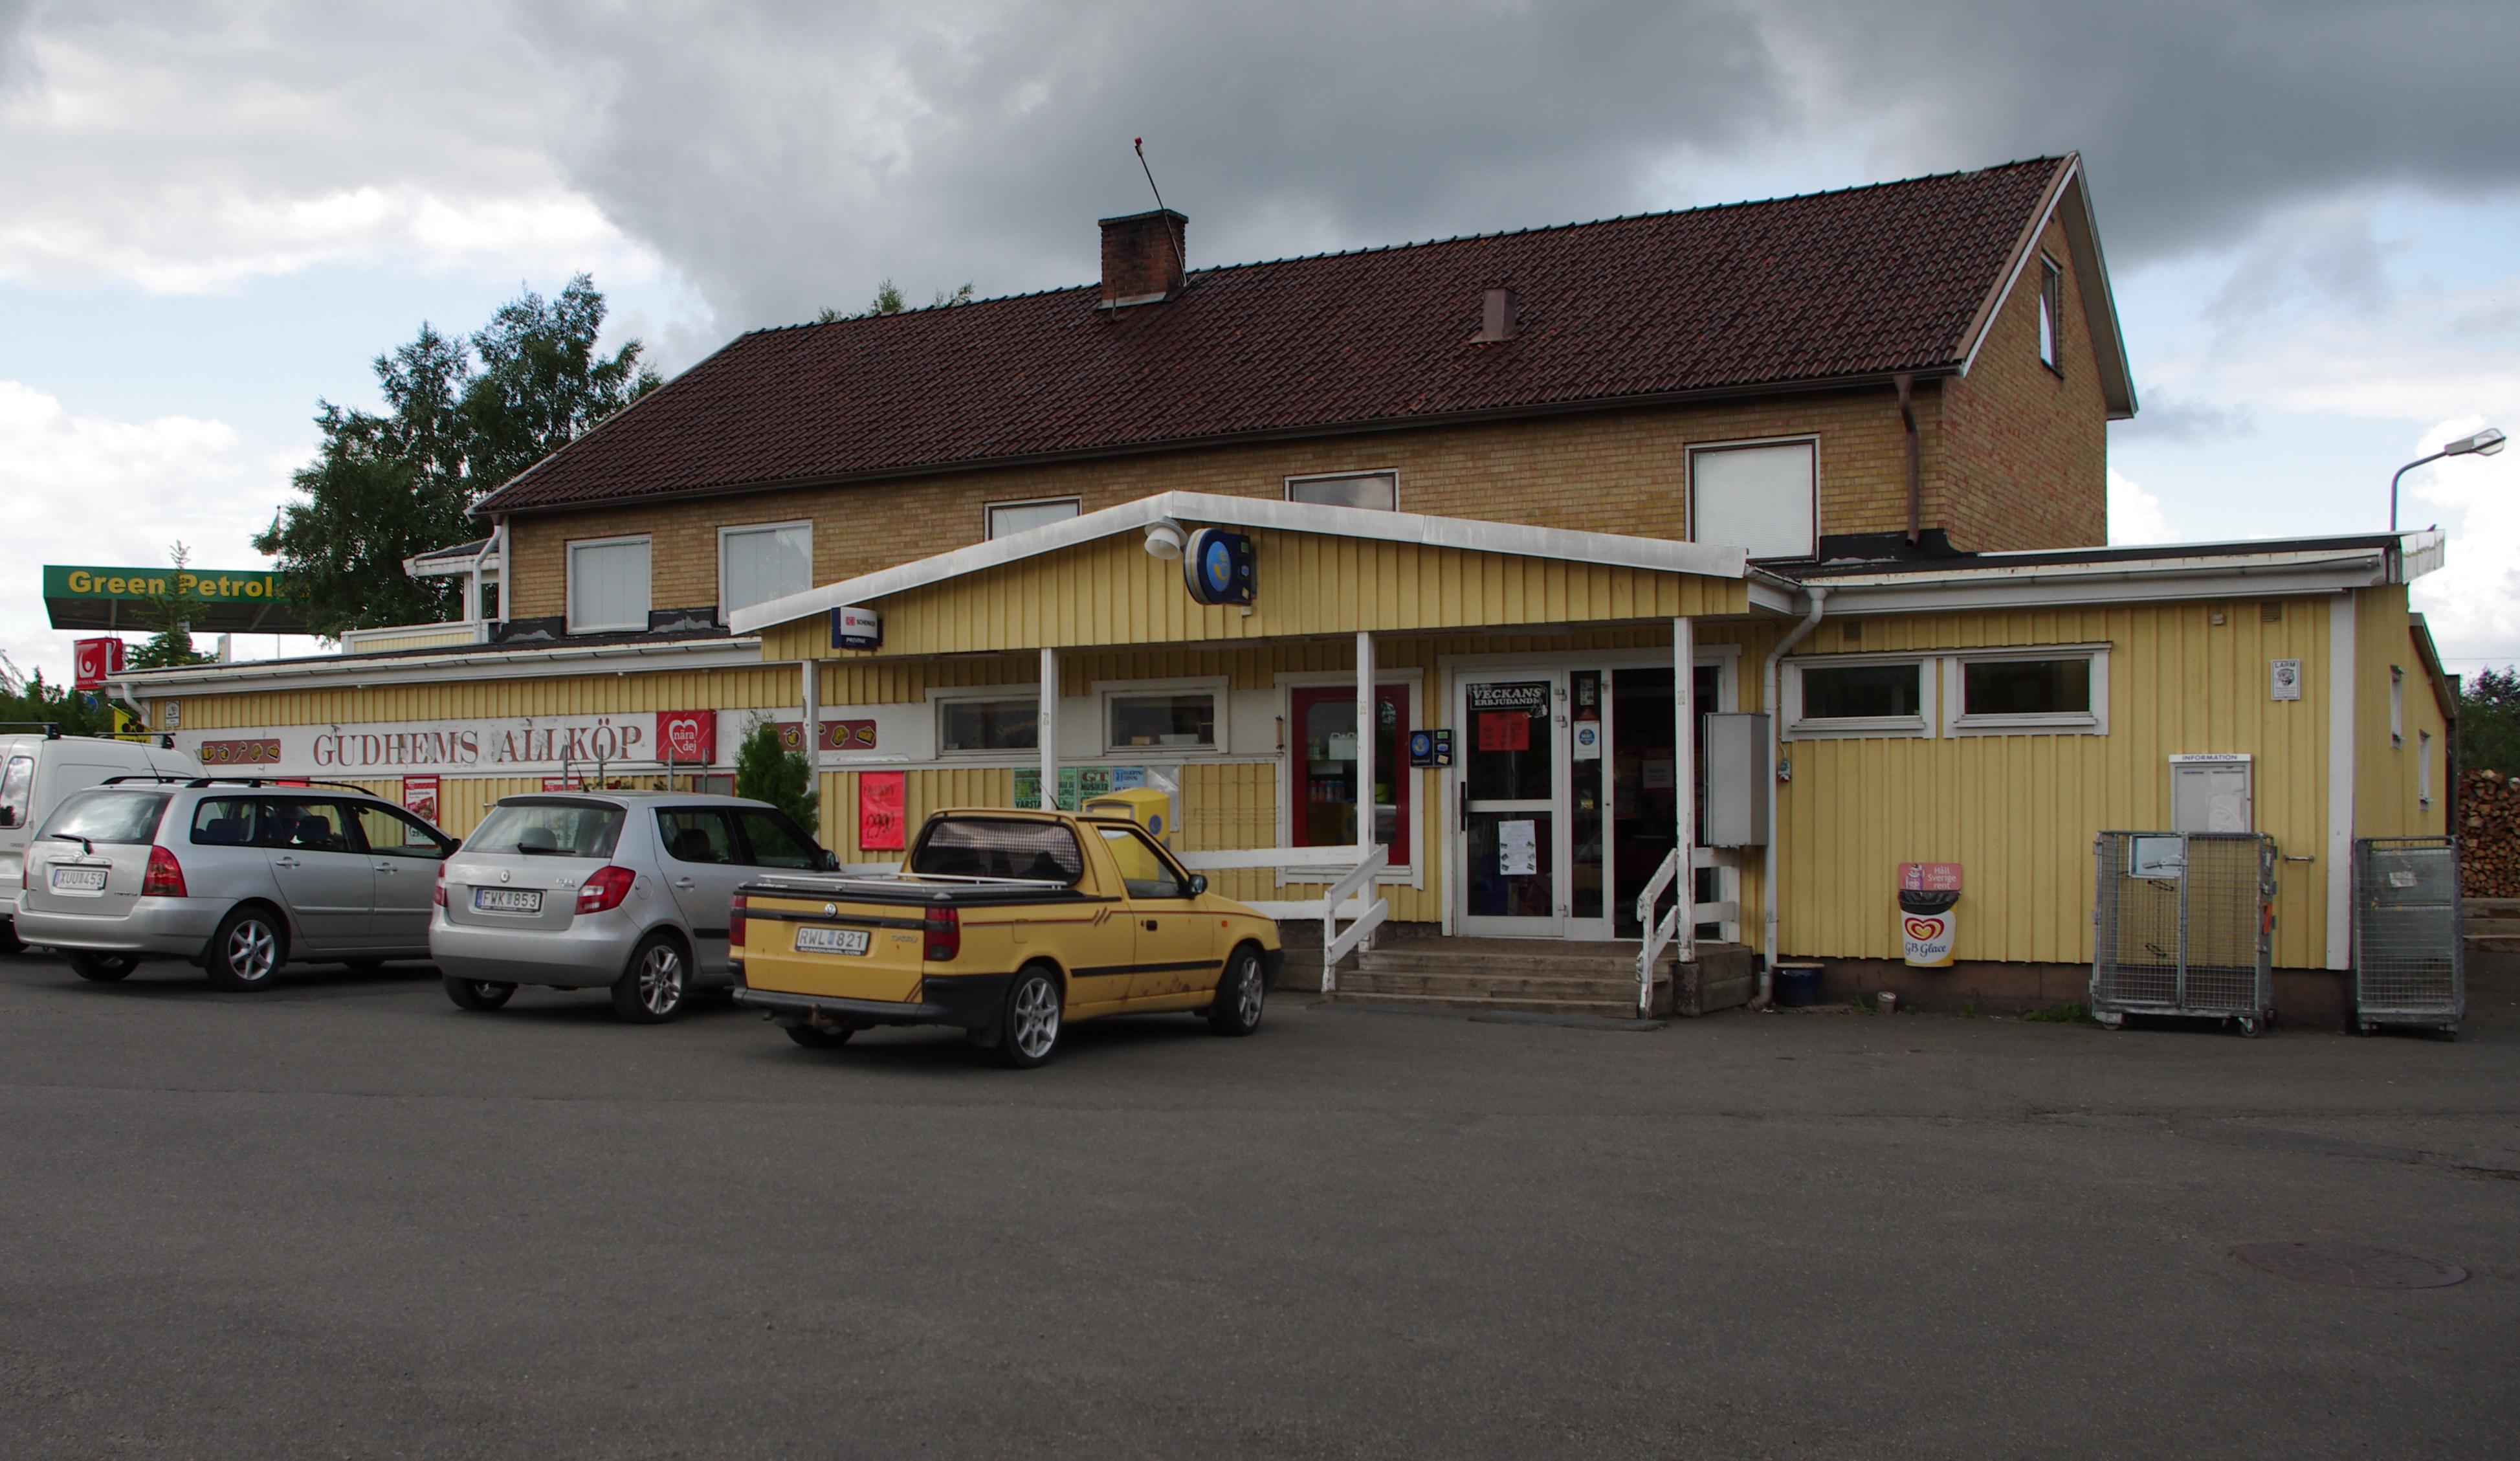 Gudhems klosterruin in Falkping, Vstra Gtalands ln - Find